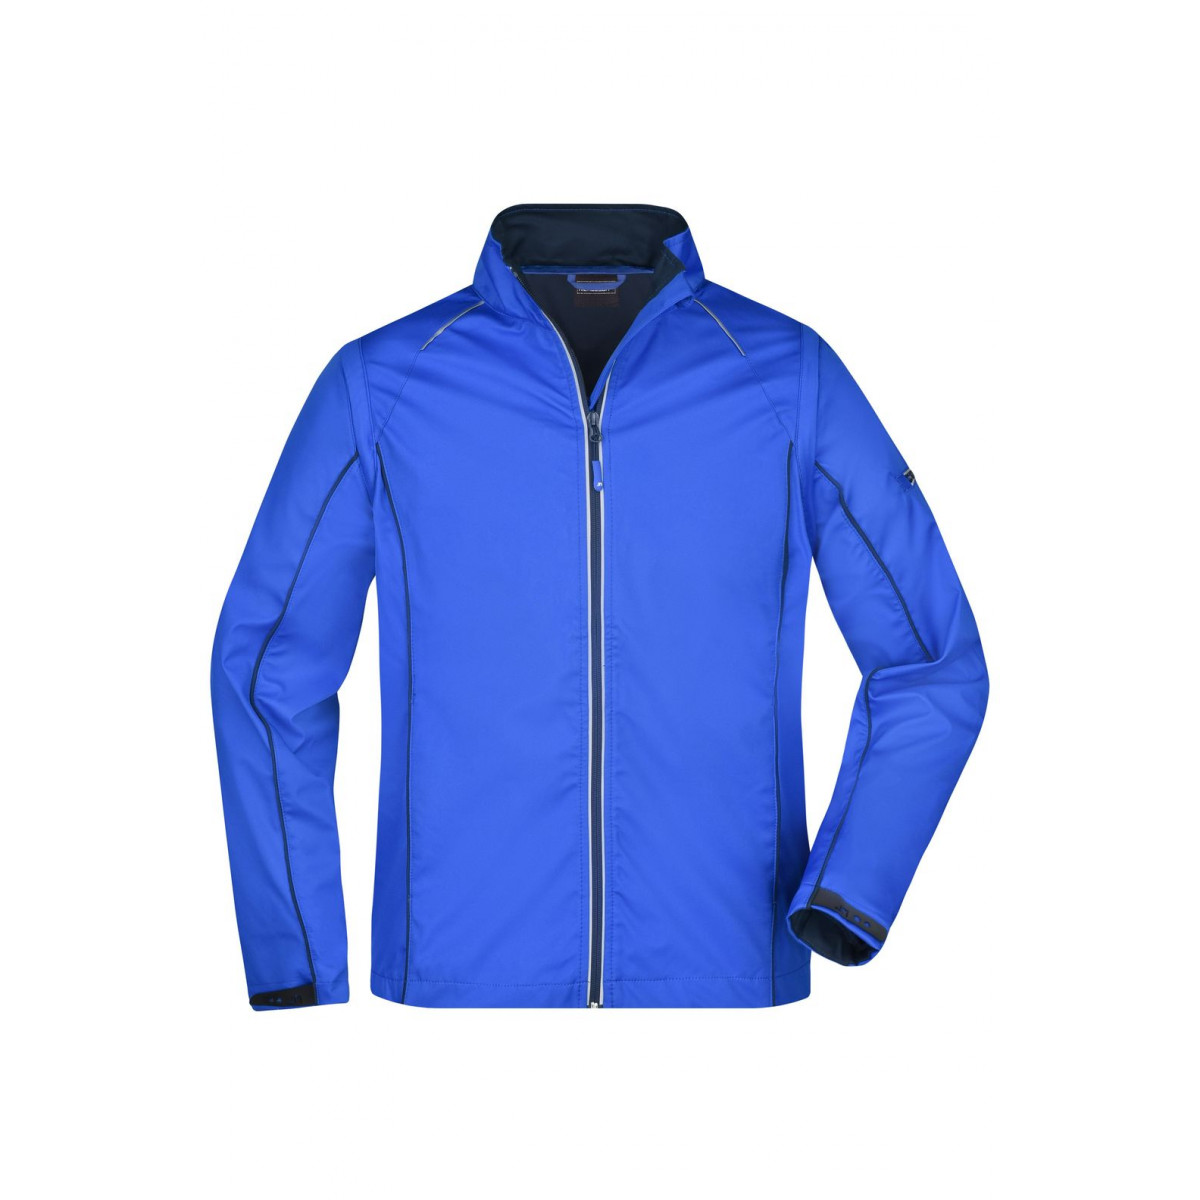 Куртка мужская JN1122 Mens Zip-Off Softshell Jacket - Темно-синий/Темно-синий